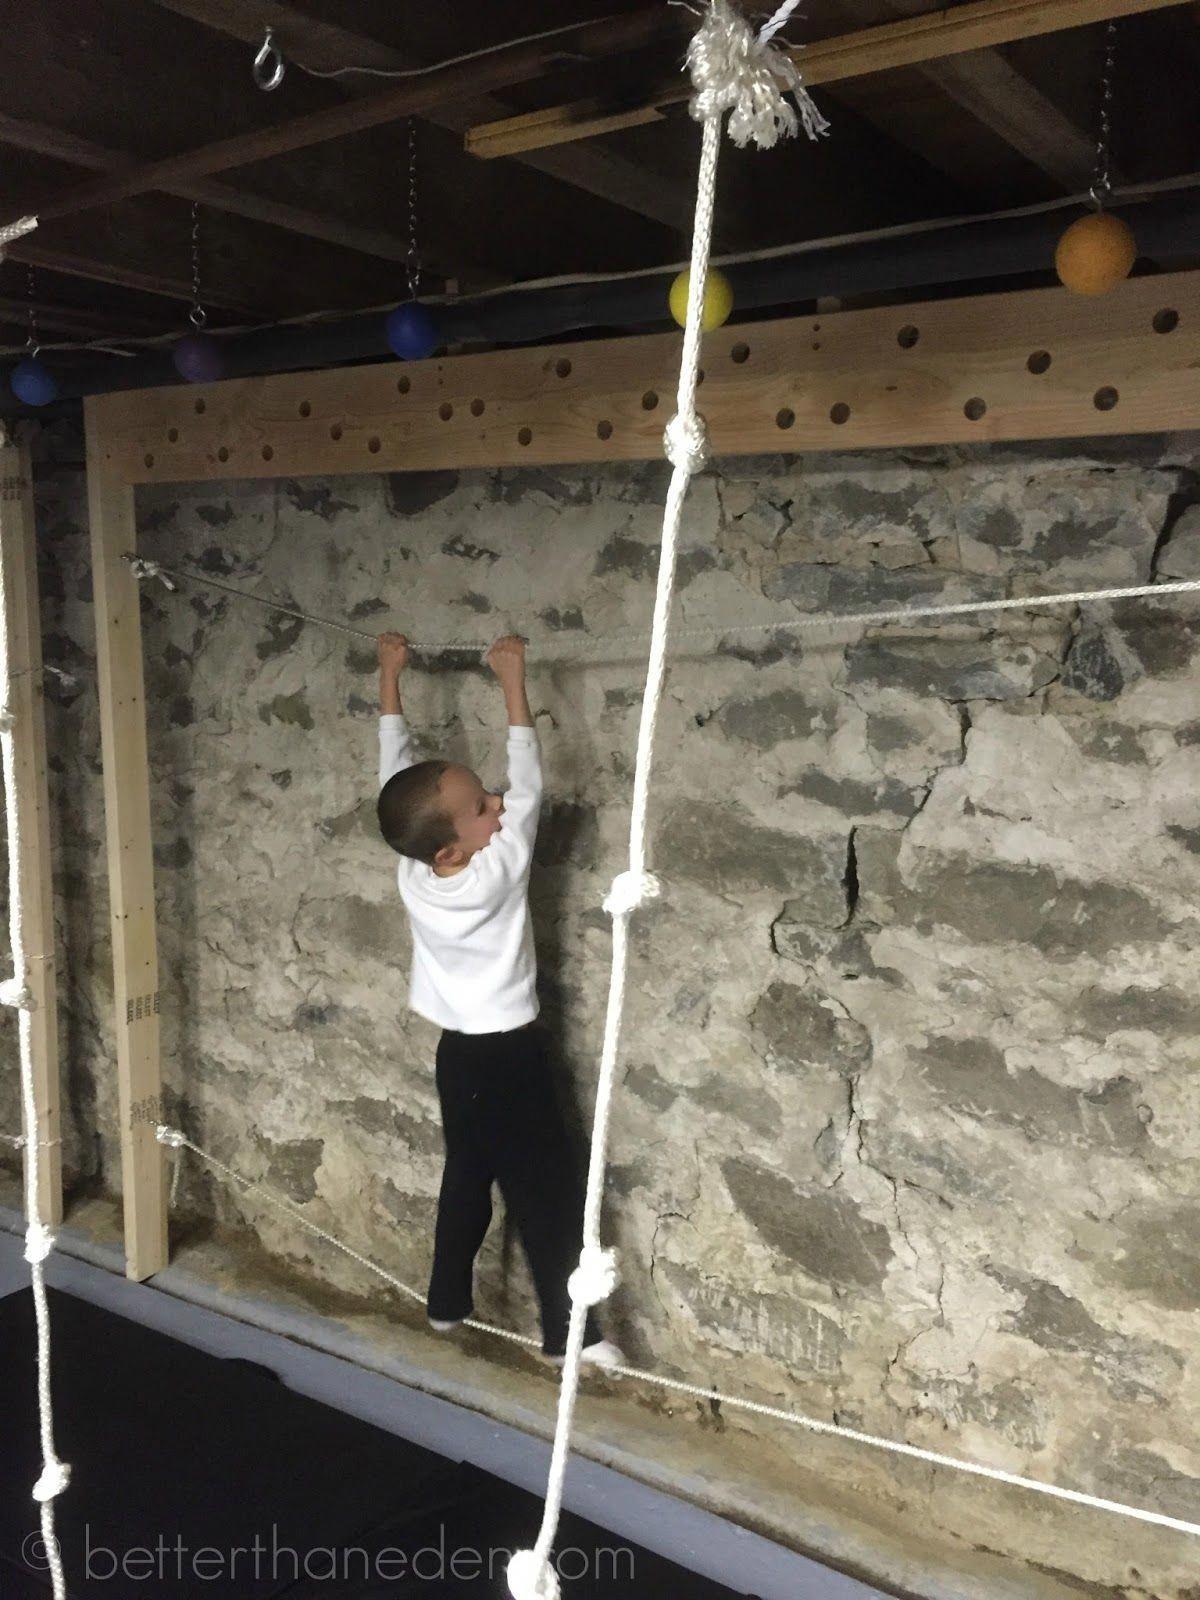 Software Interior Design 3d Free Download Interiordesigncolleges Interiorfrenchdoorsizes Basement Playroom Basement Gym At Home Gym